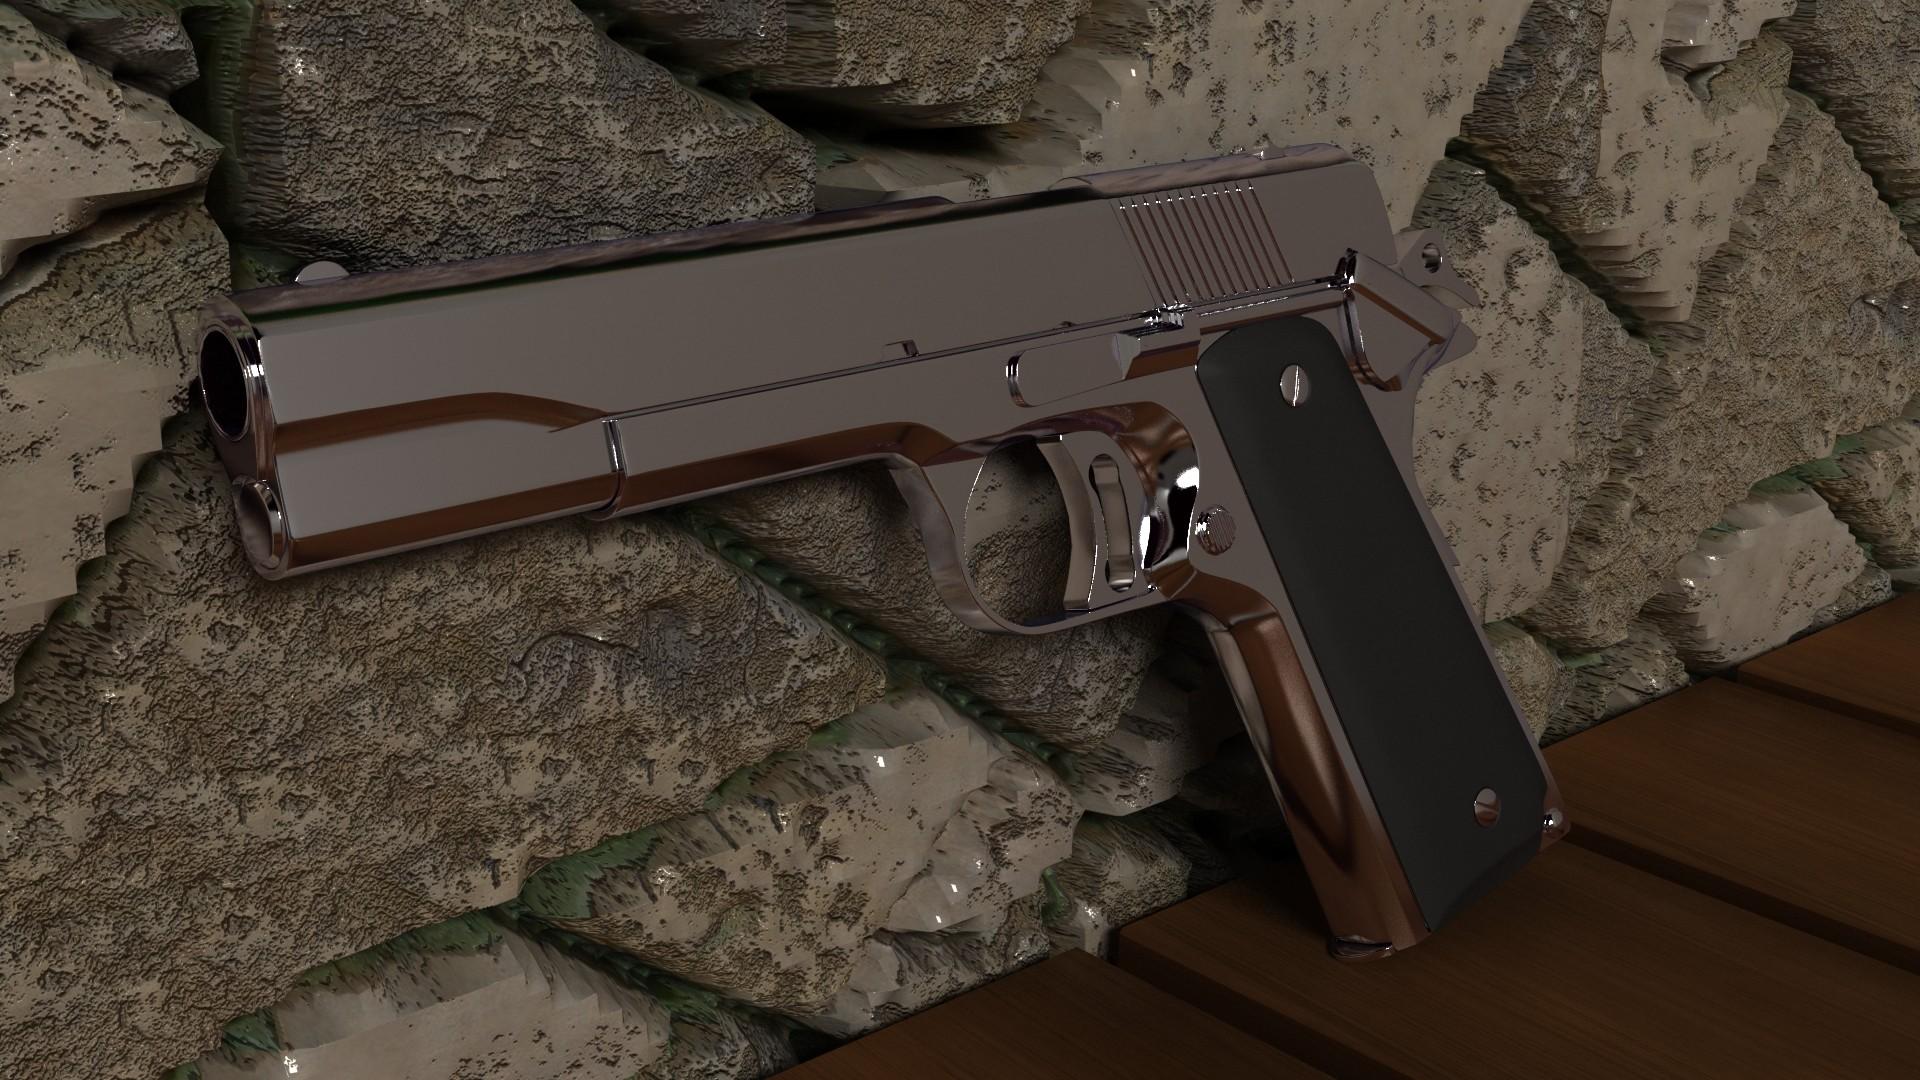 Colt 1911 Wallpaper (68+ images)